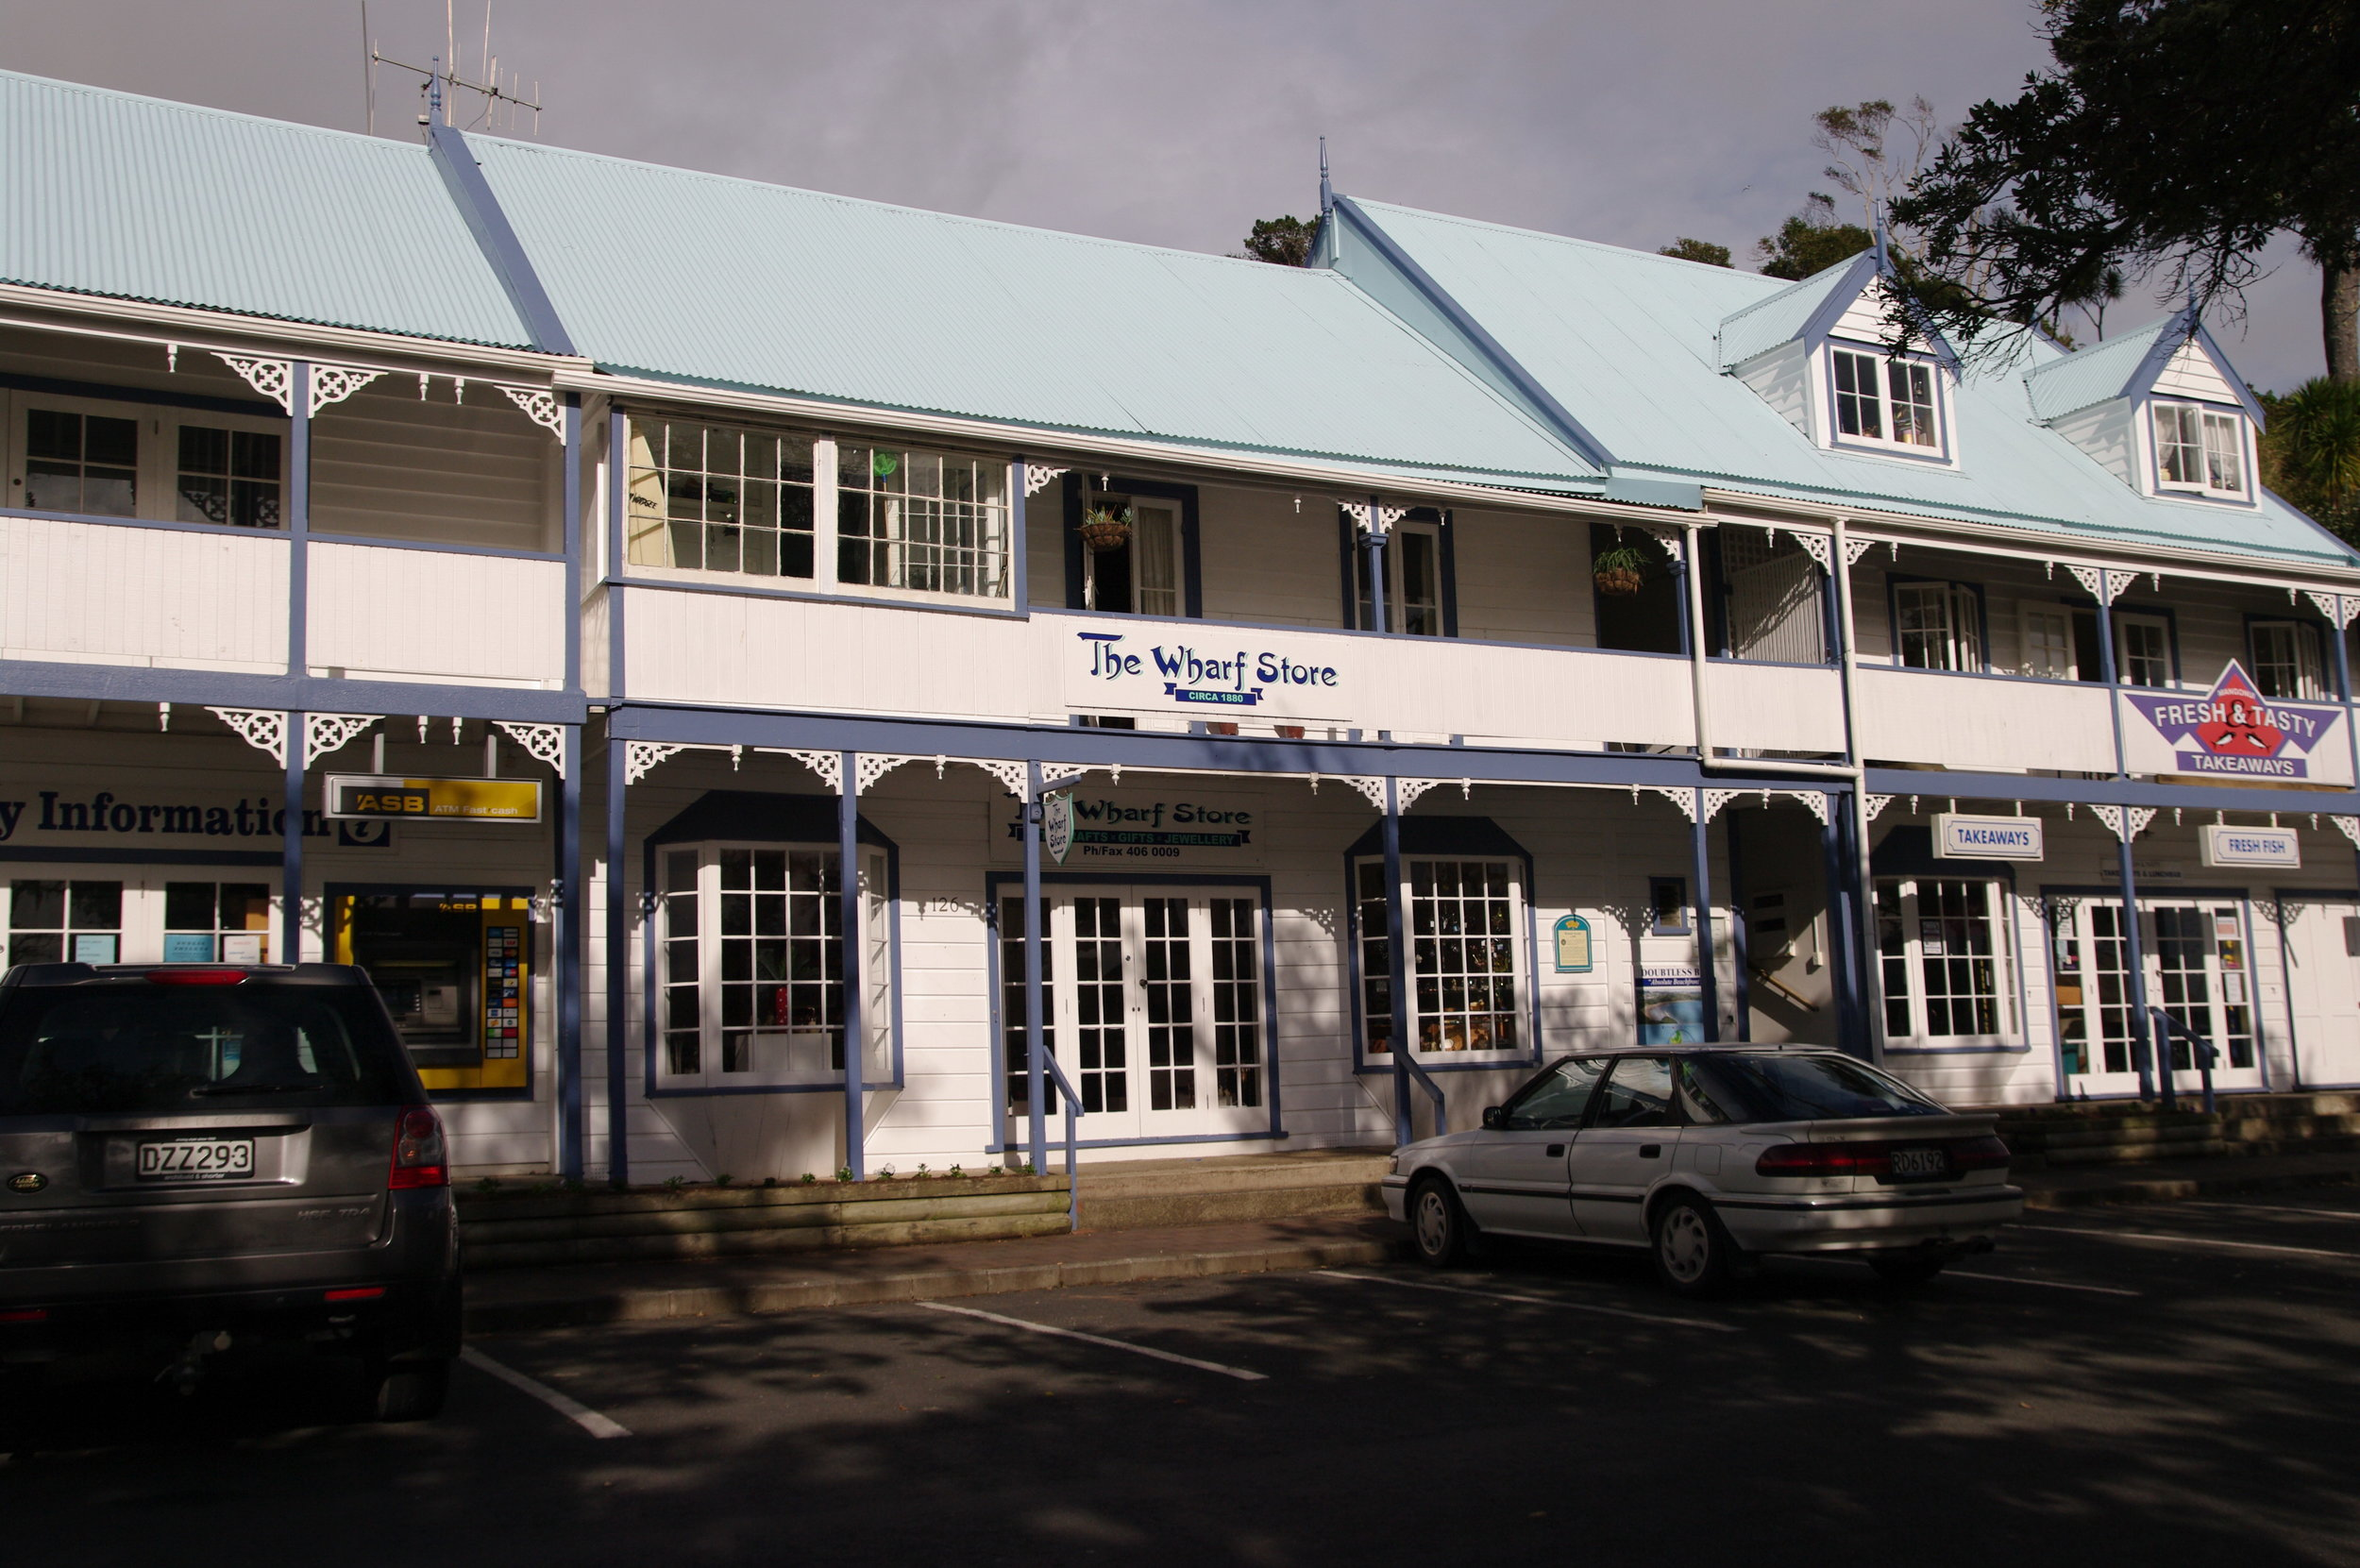 MBH Mangonui Wharf Store.jpg